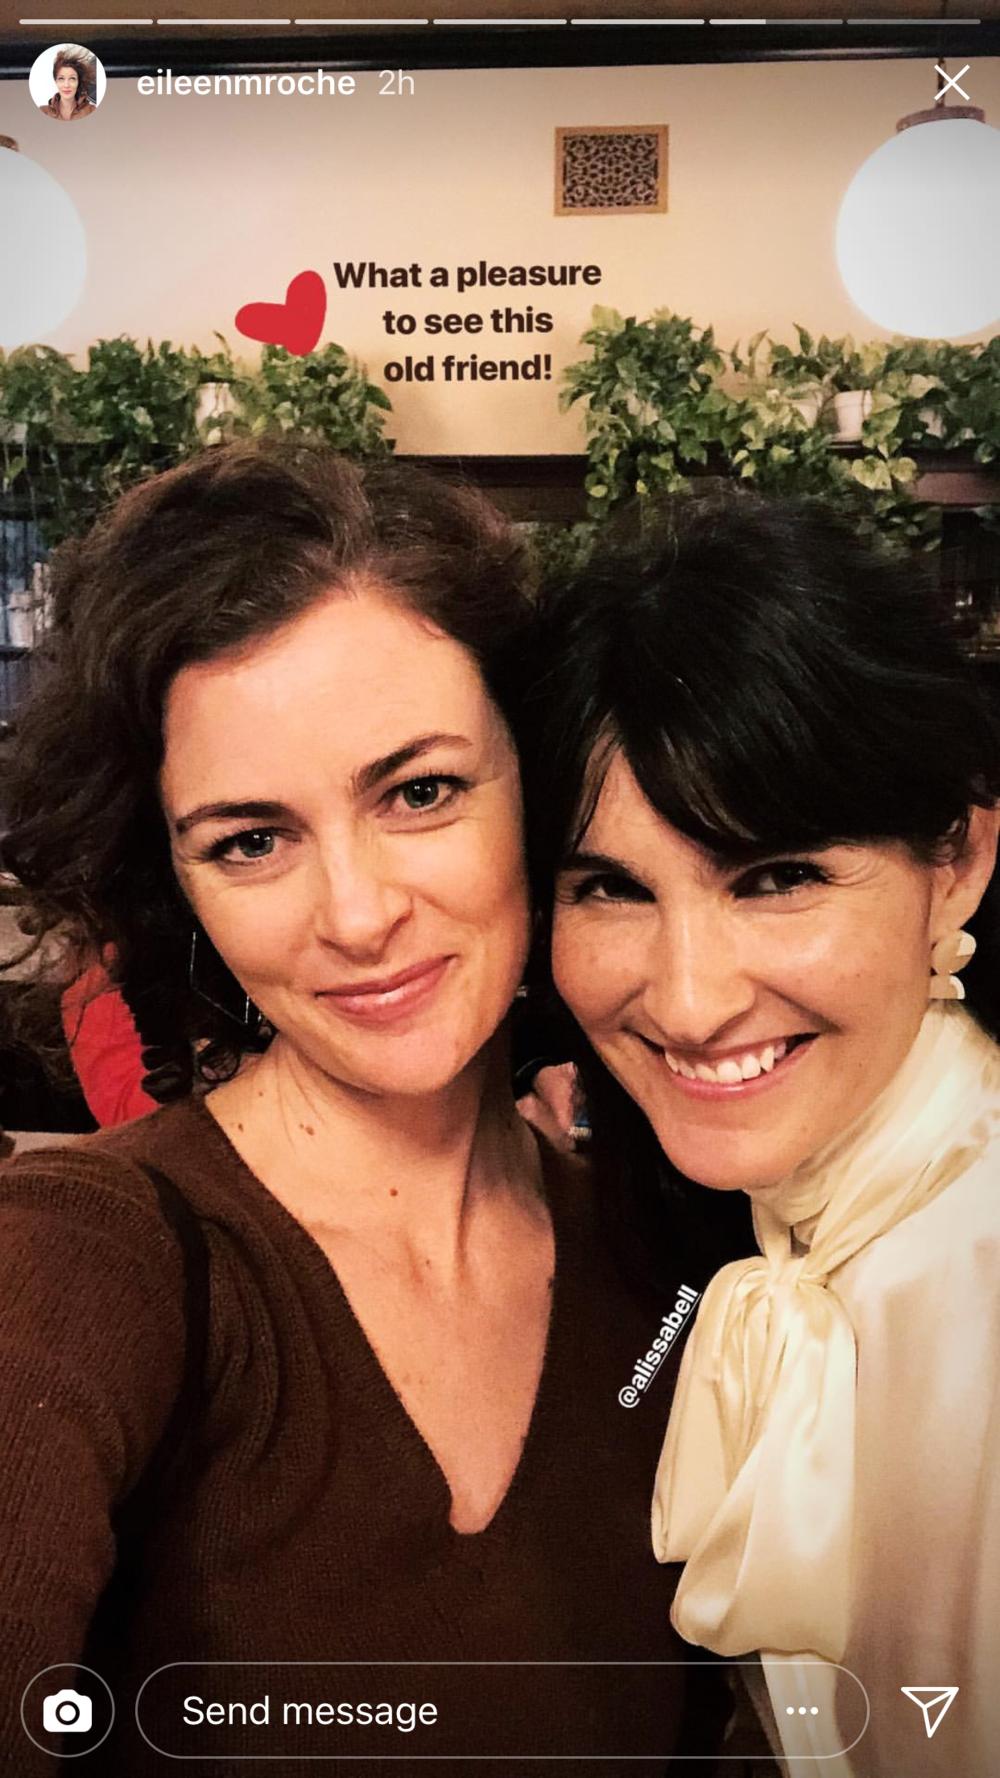 Alissa Bell & Eileen Roche